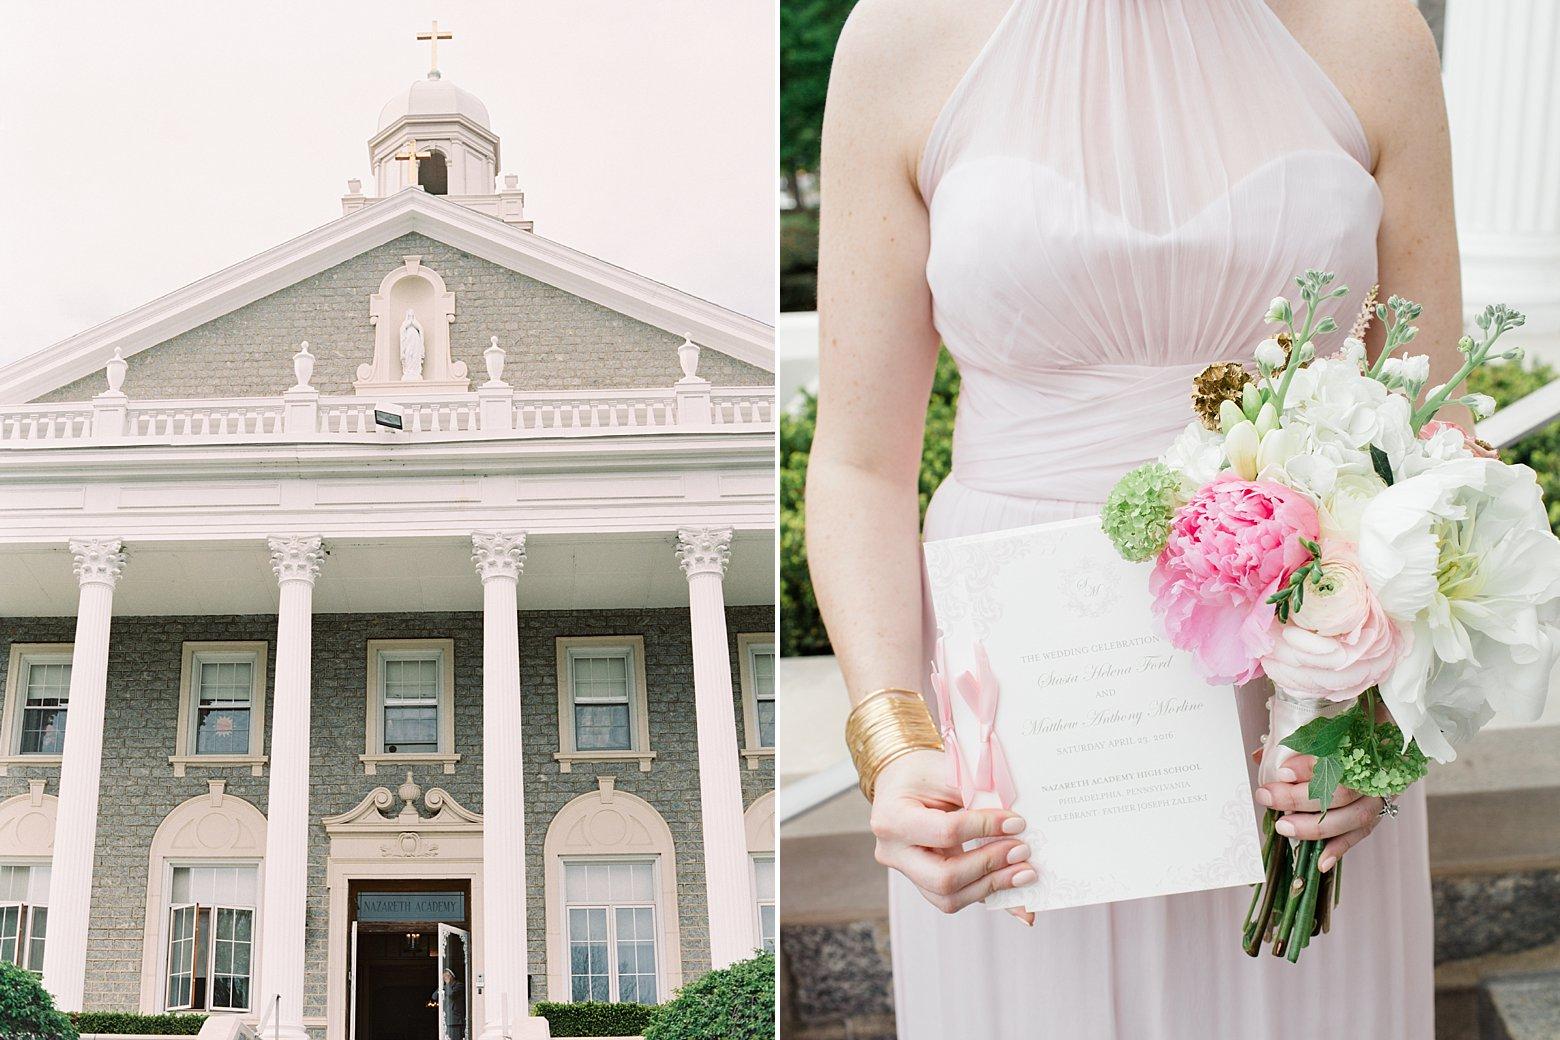 lauren_fair_photography_april_lynn_designs_stasia_matt_spring_cairnwood_estate_wedding_northeast_philadelphia_blush_pink_gold_wedding_invitation_stationery_0042